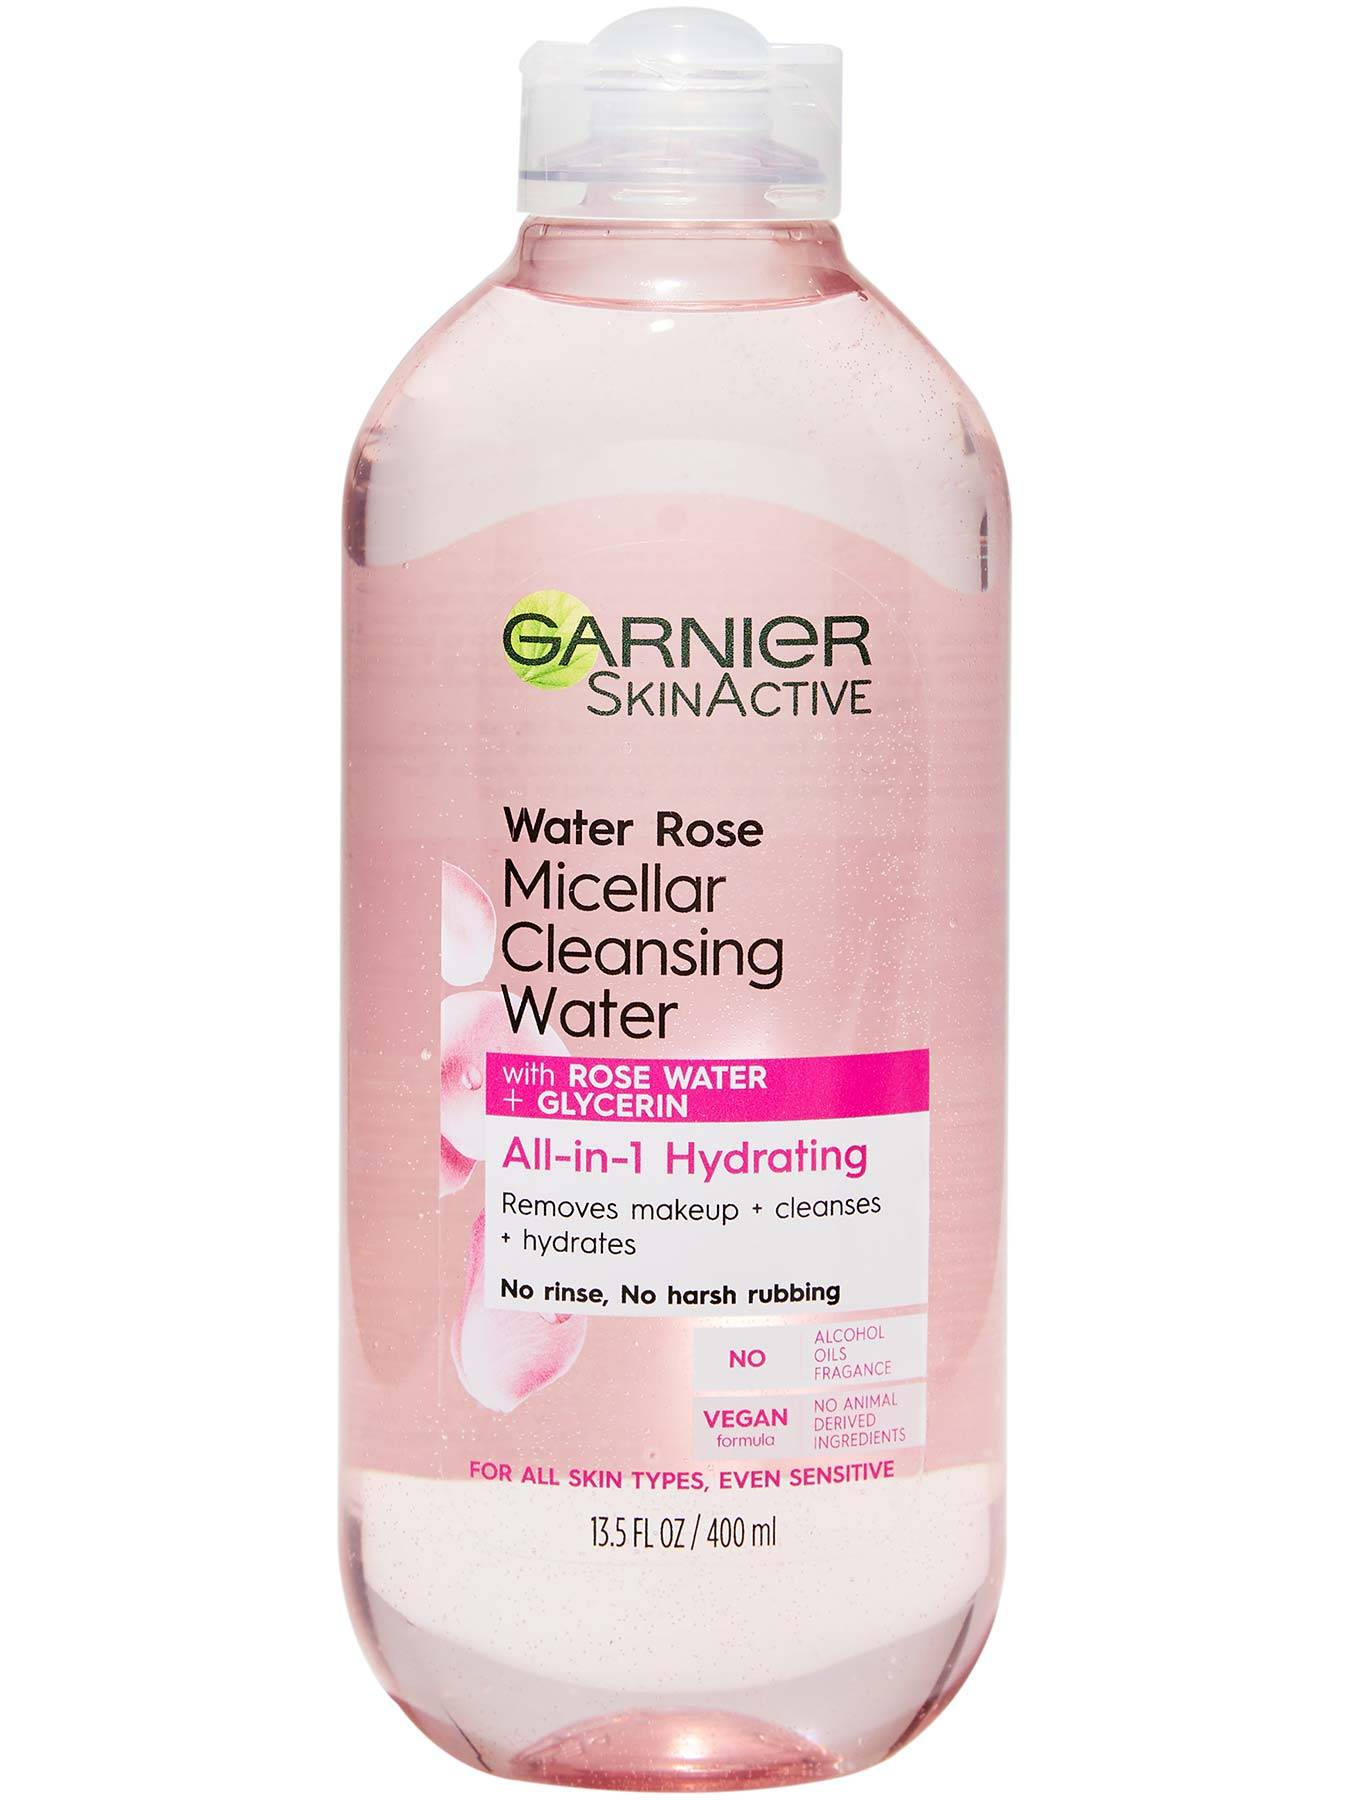 Garnier SkinActive - Water Rose Micellar Cleansing Water